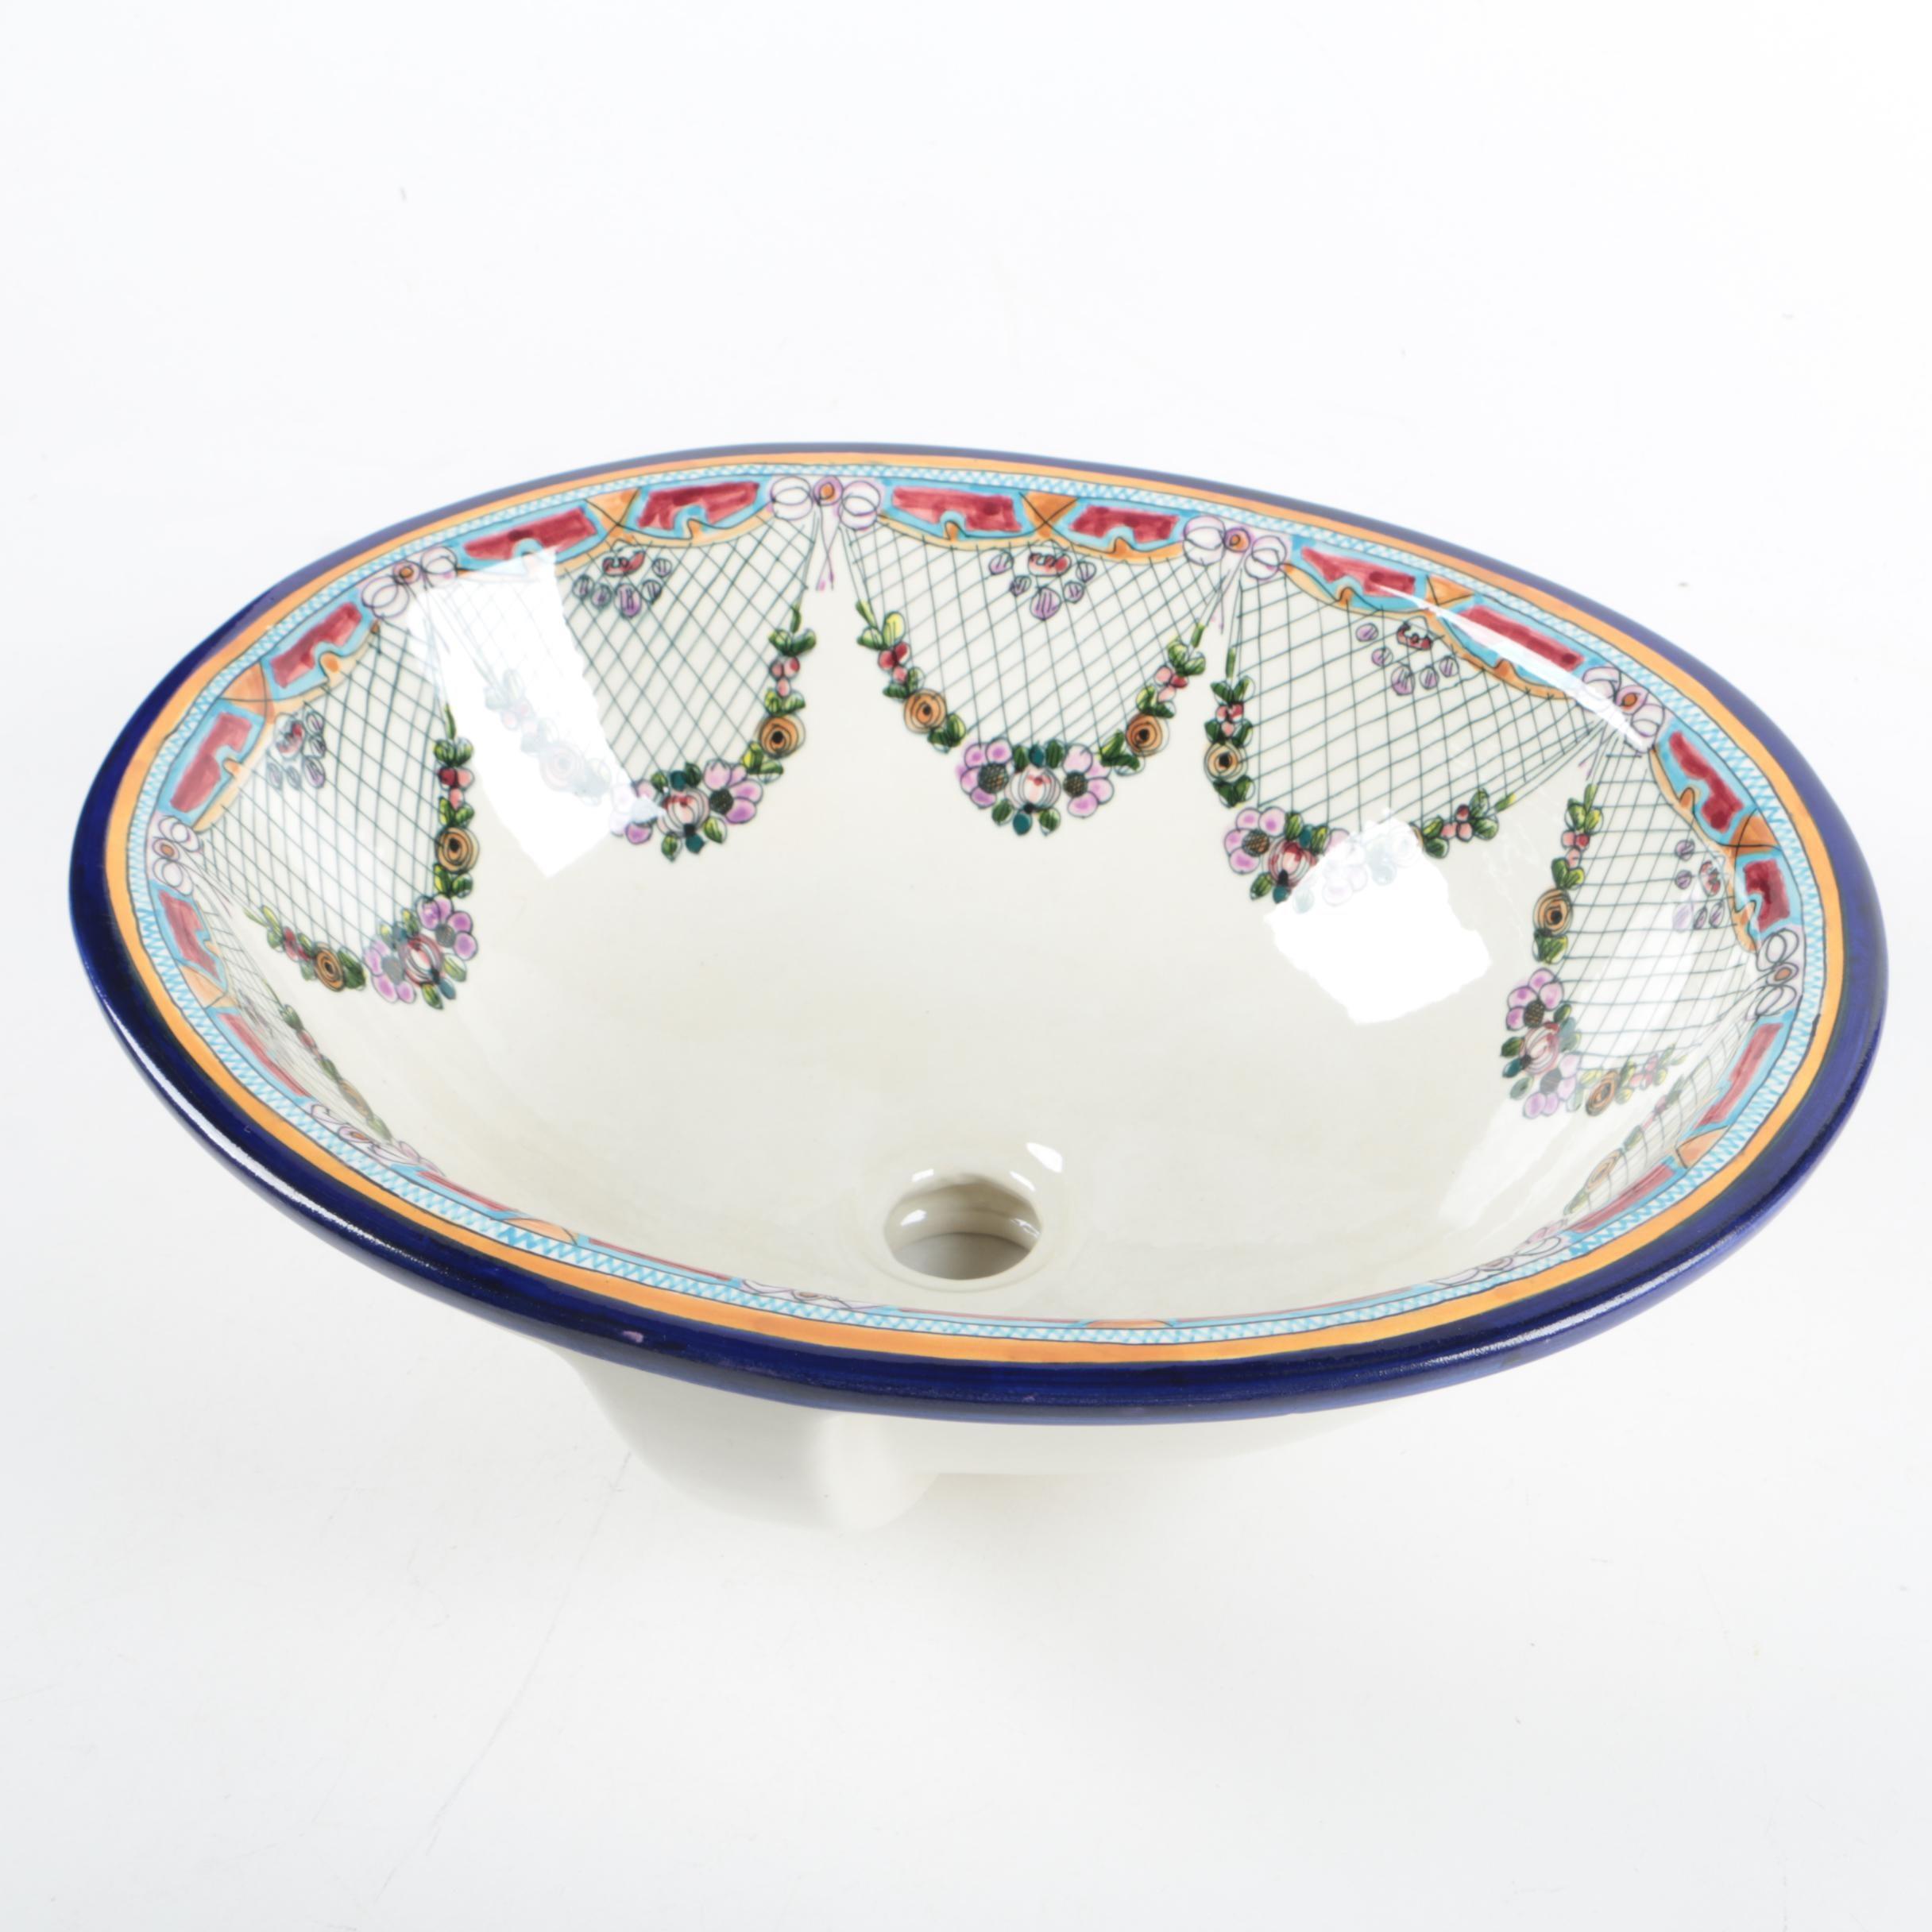 Oval Hand-Painted Porcelain Vessel Sink